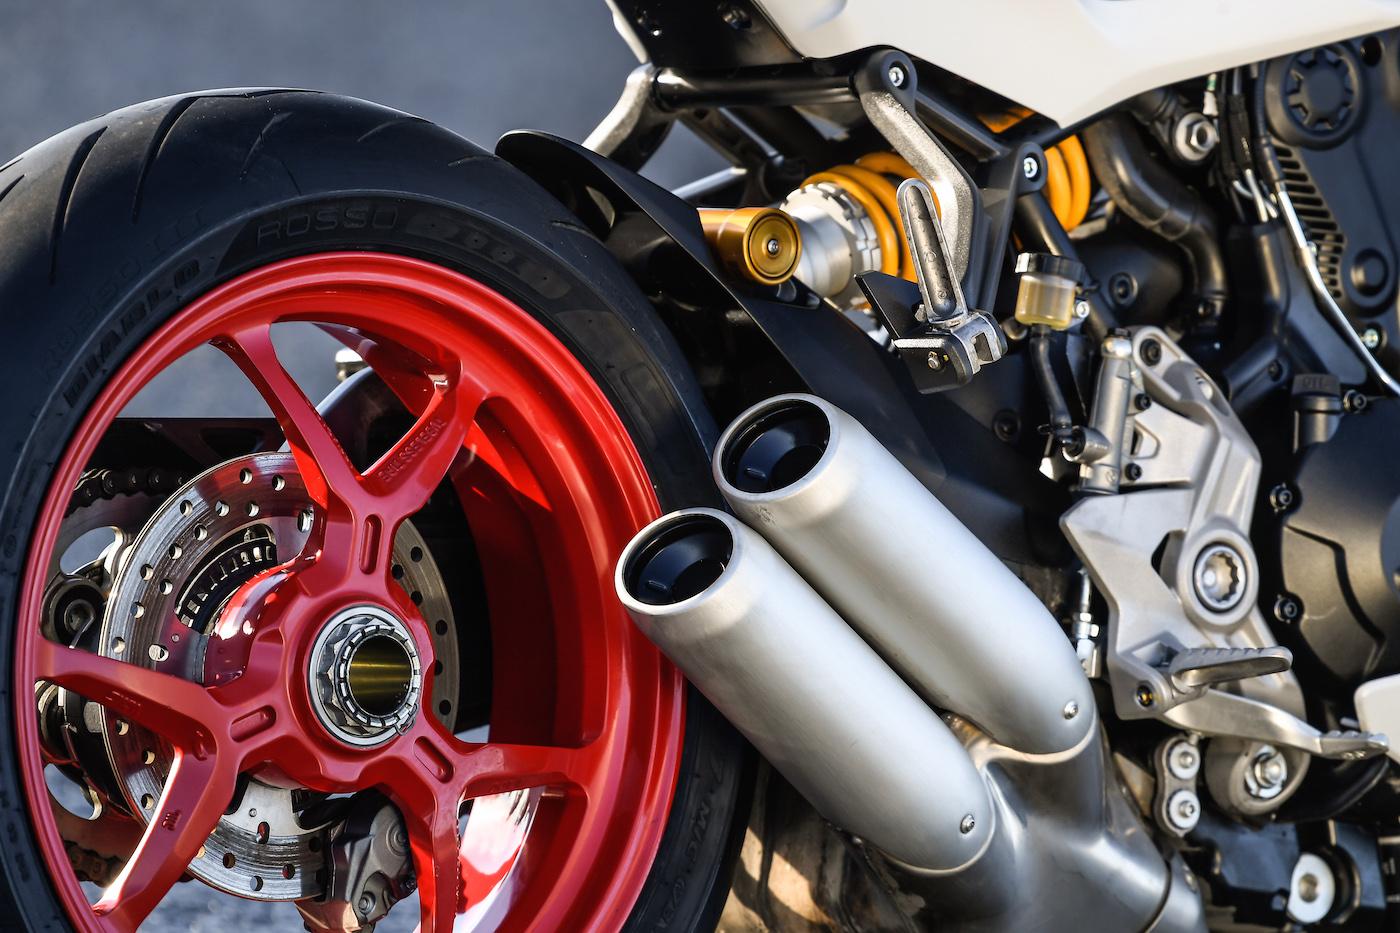 Ducati_Supersport_S_smalldet2